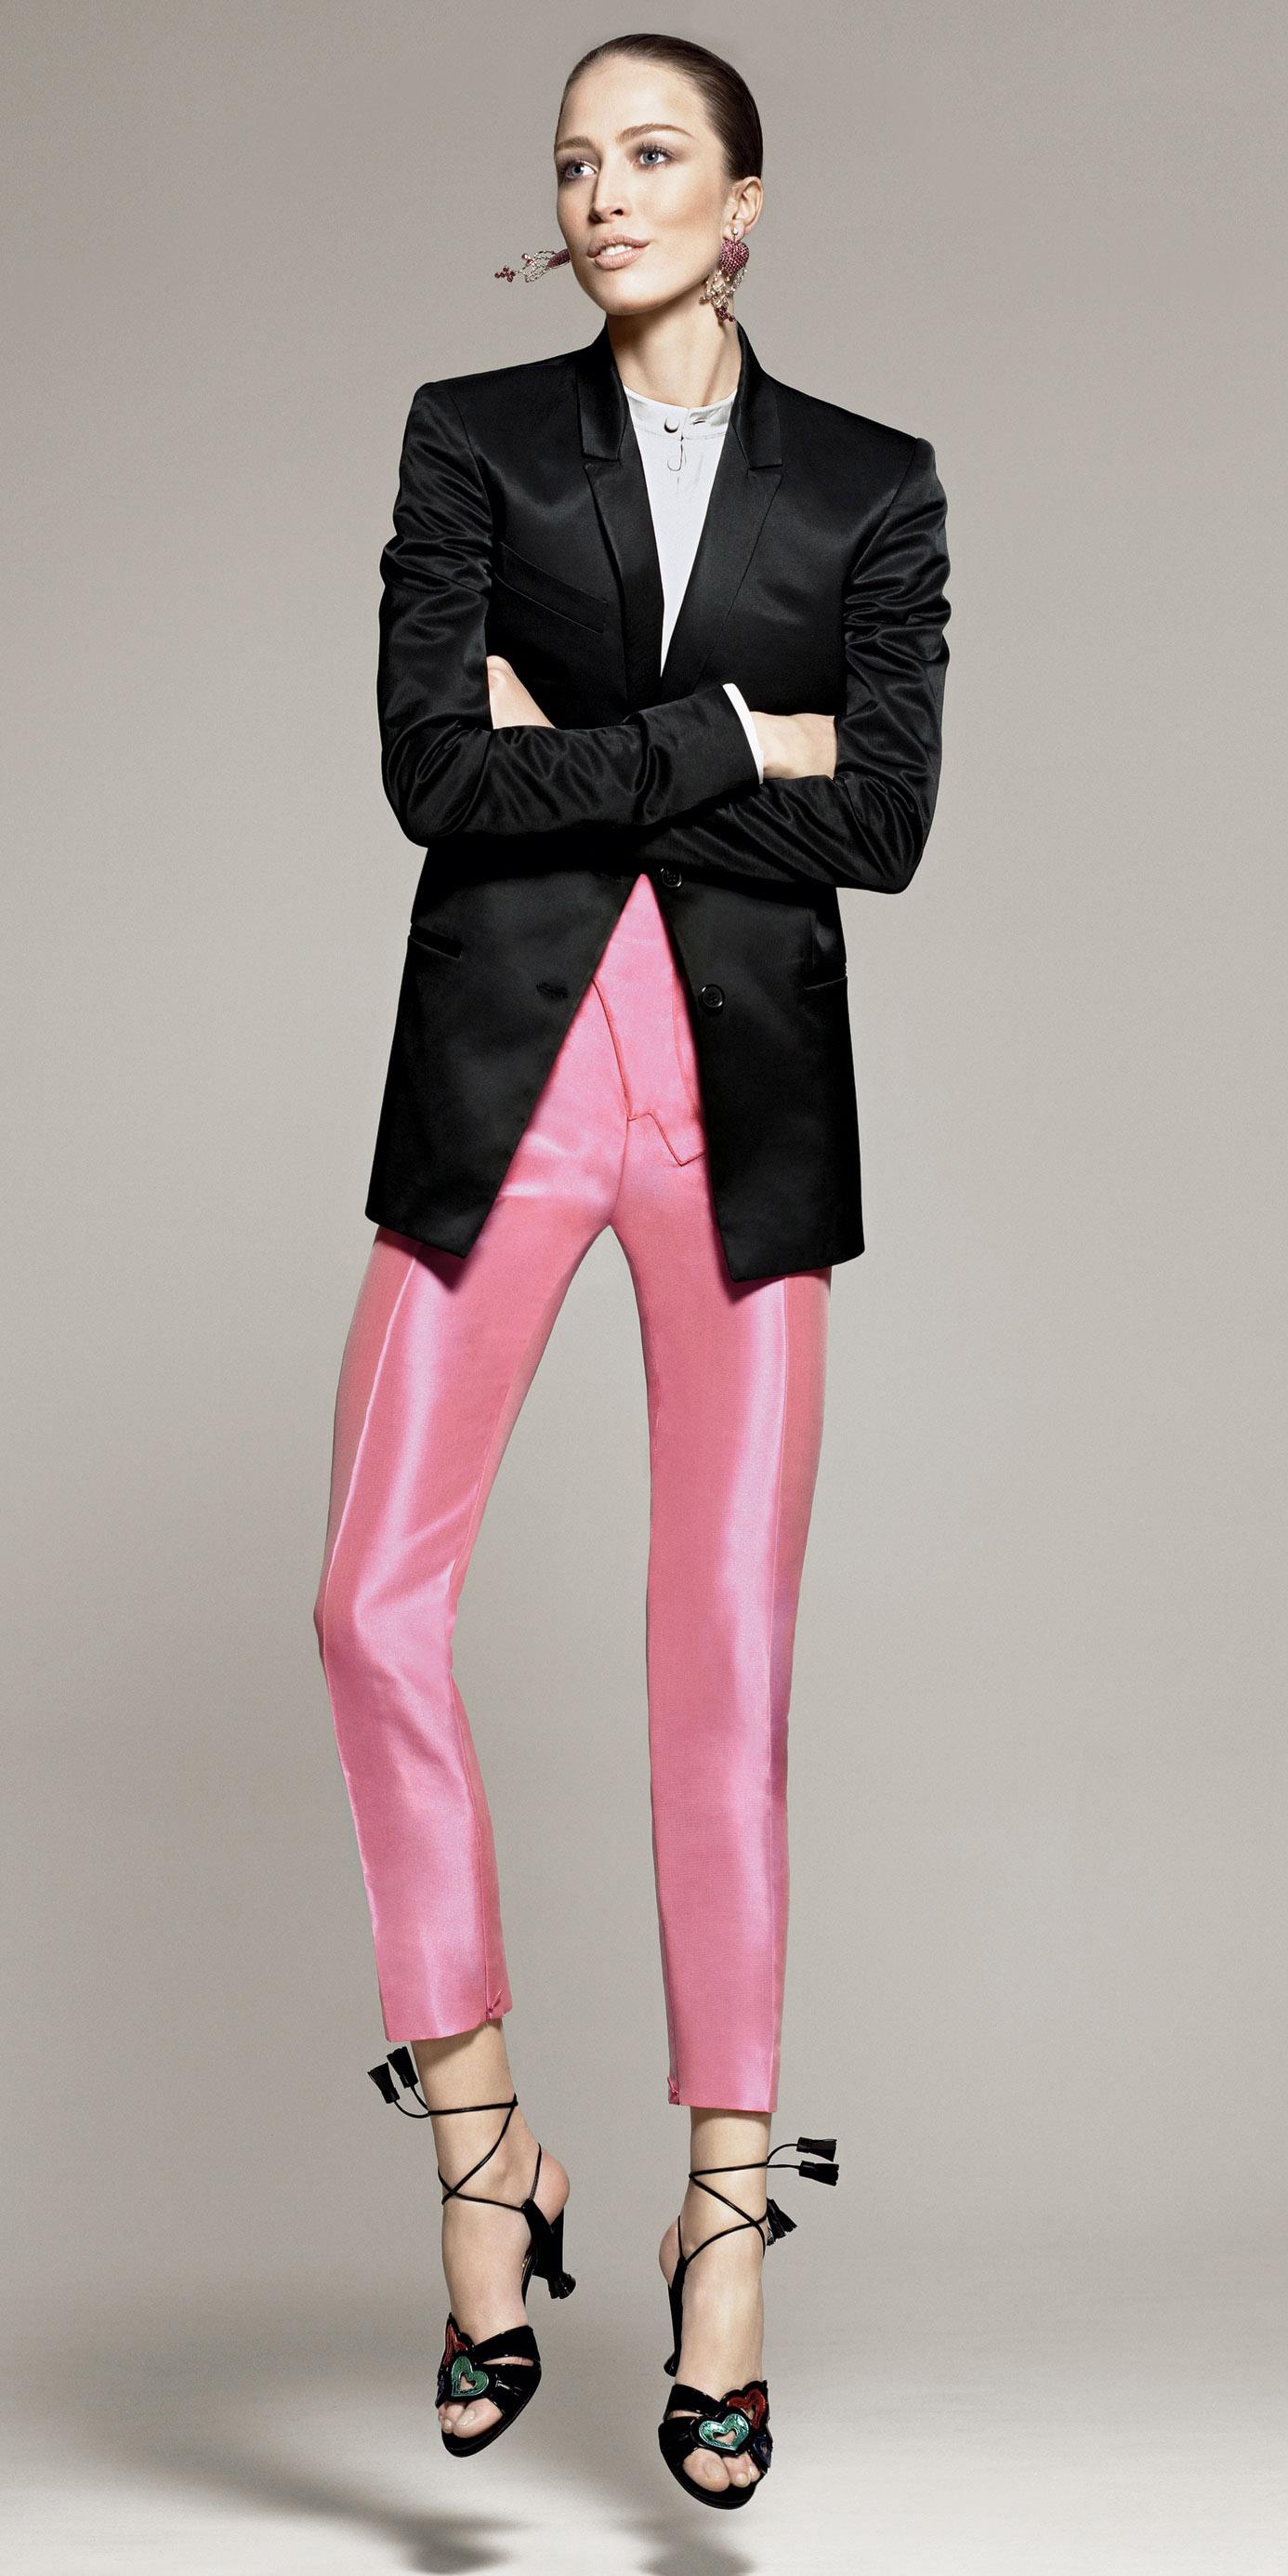 what-to-wear-for-a-fall-wedding-guest-outfit-pink-light-slim-pants-black-jacket-blazer-hairr-bun-earrings-black-shoe-sandalh-dinner.jpg